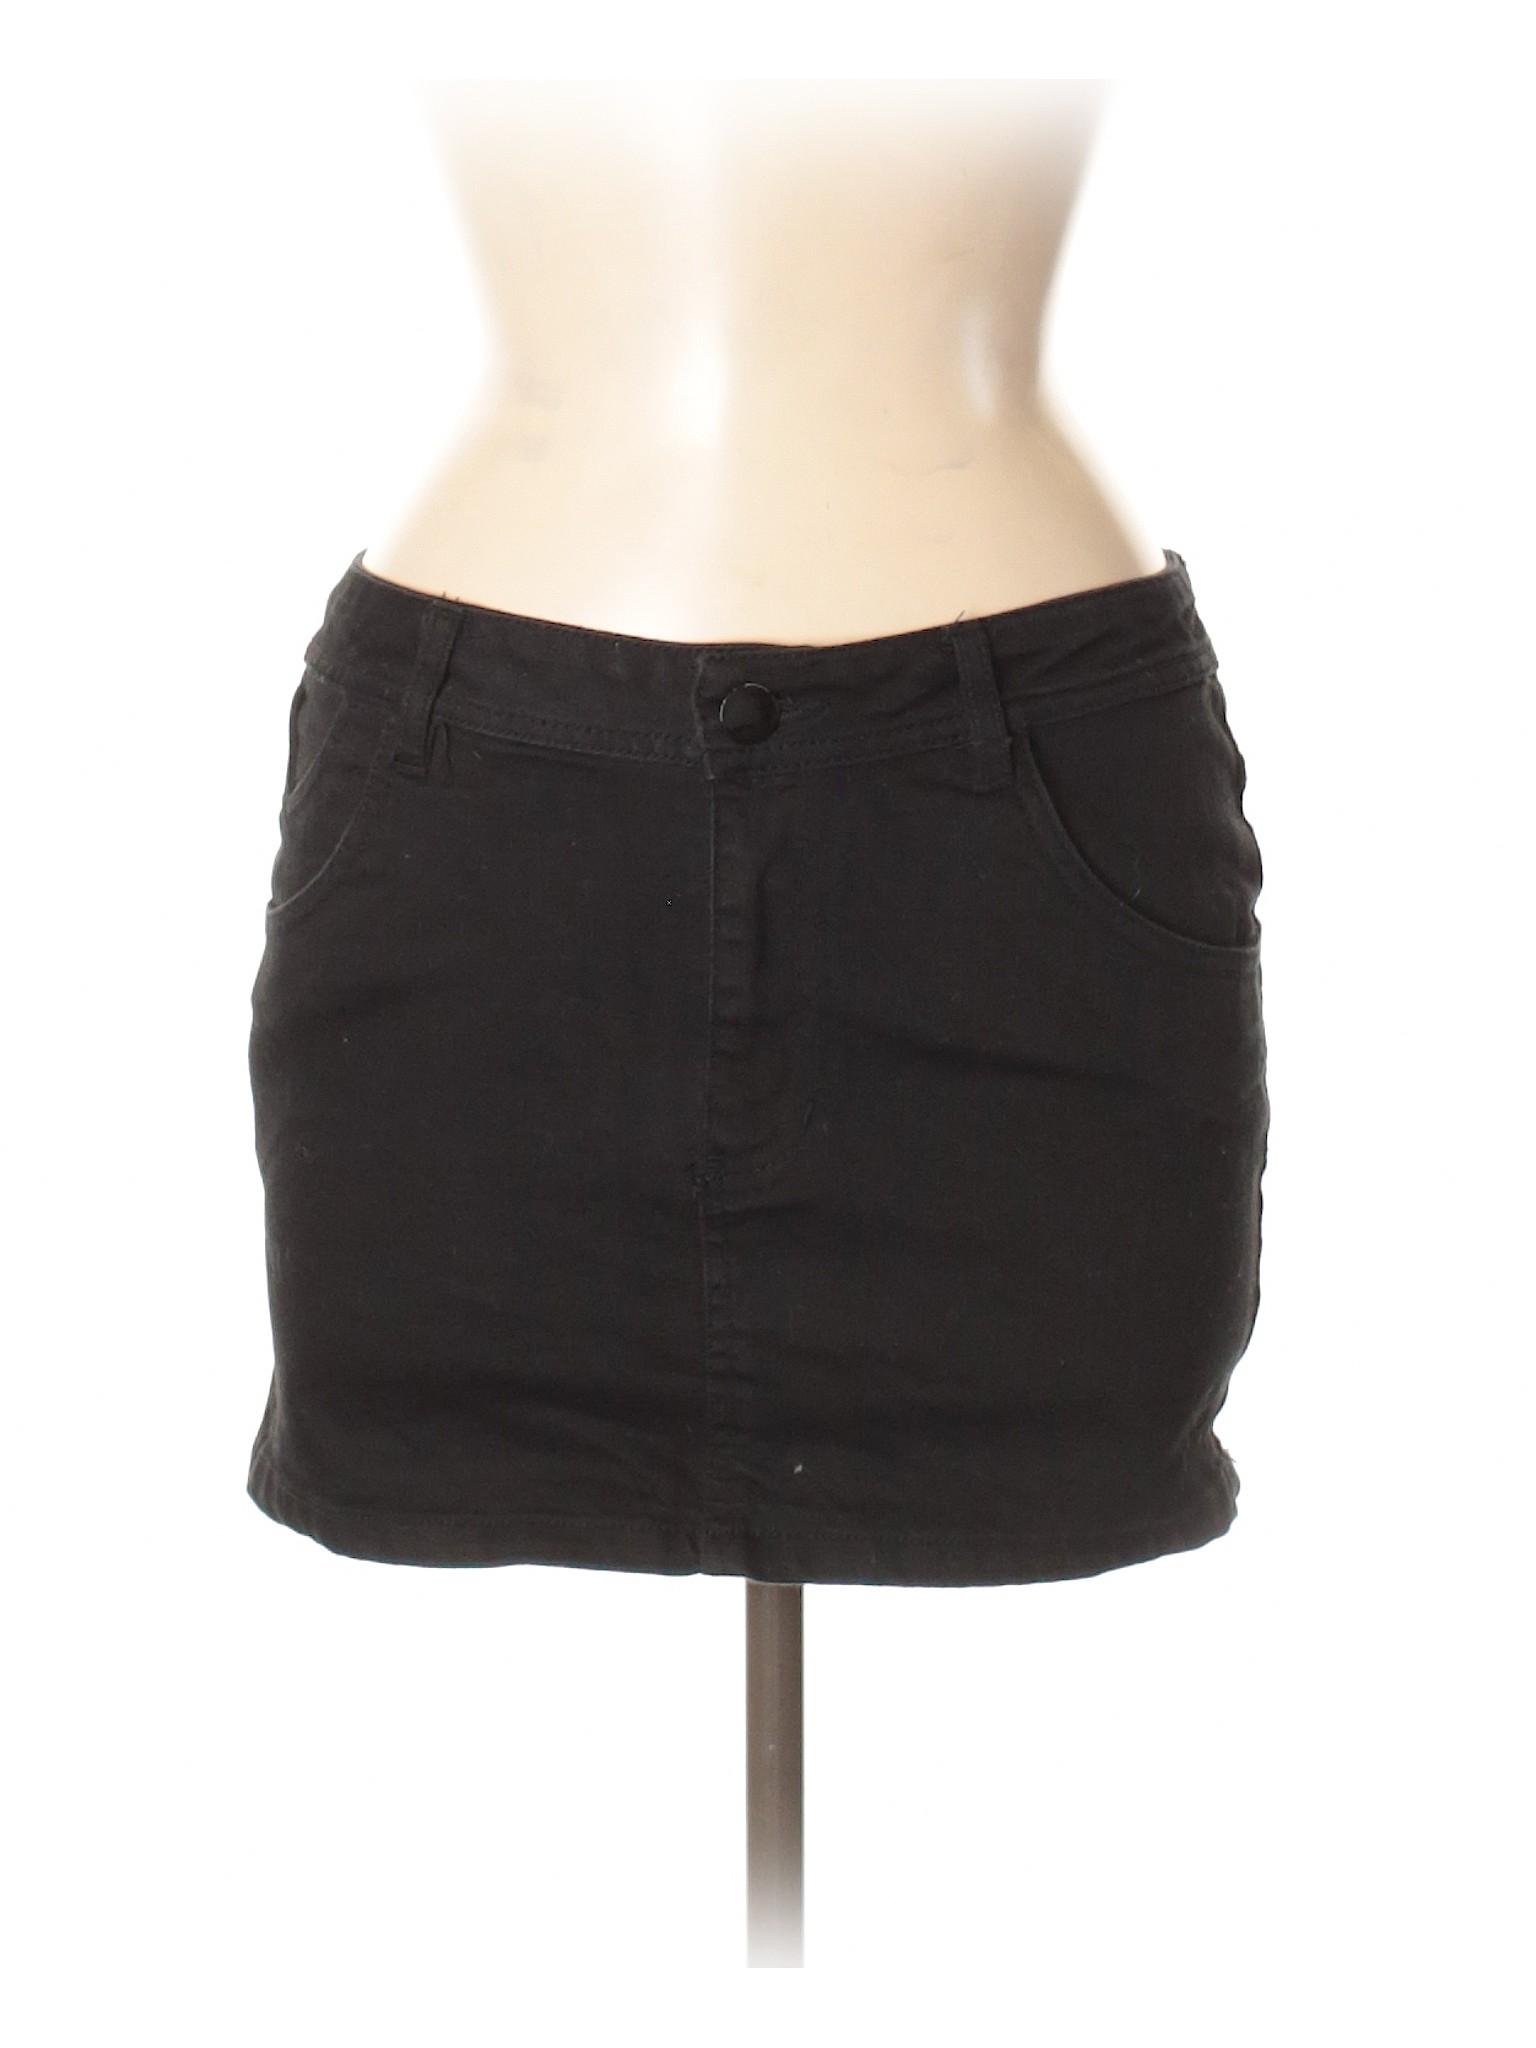 Skirt Denim Skirt Denim Boutique Denim Denim Denim Skirt Boutique Skirt Skirt Boutique Boutique Denim Boutique Boutique g6gqzxAZ